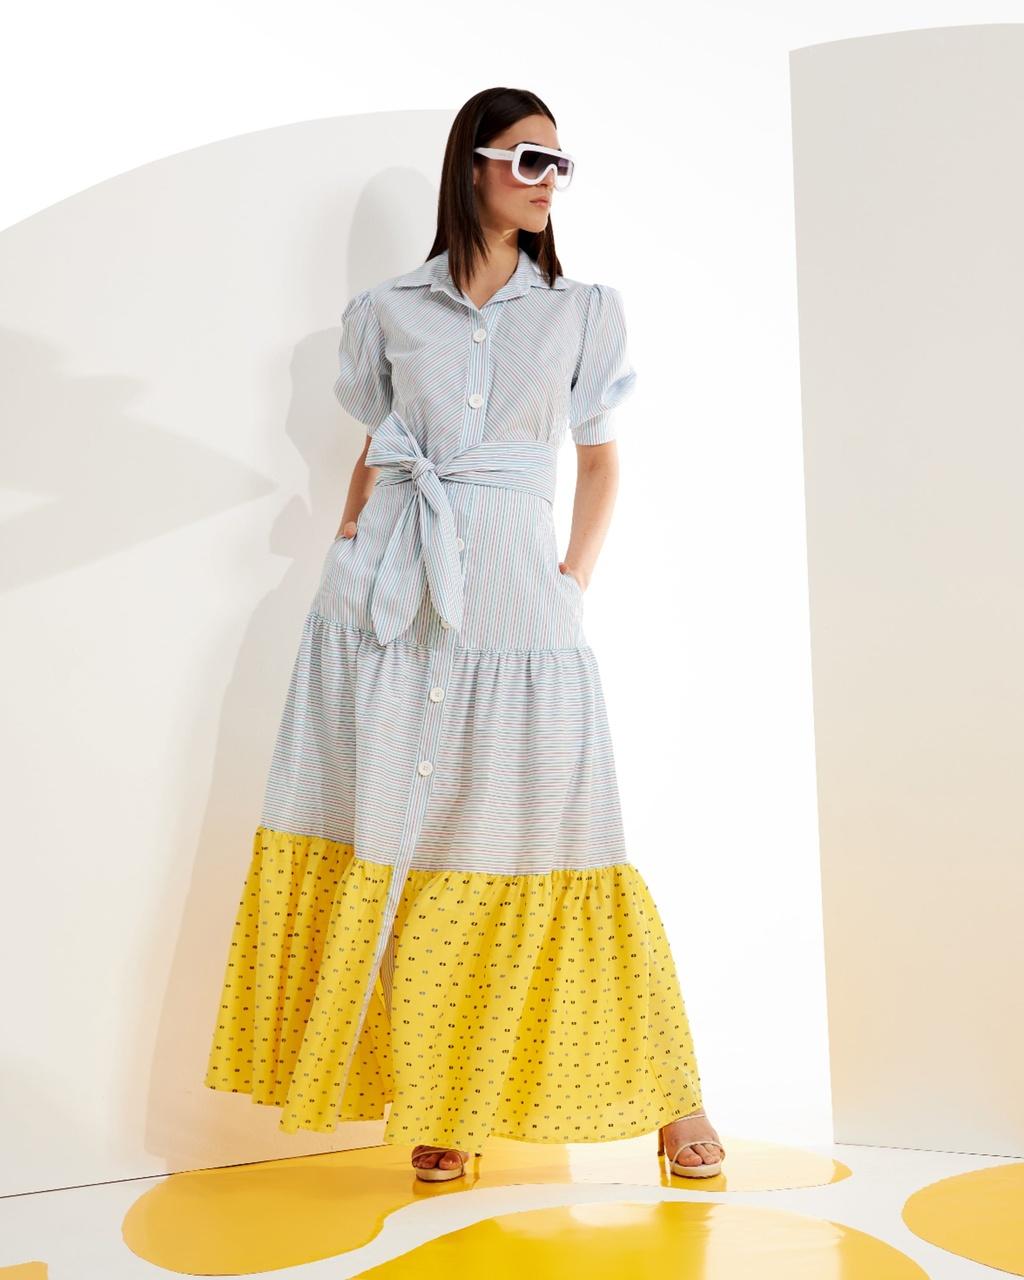 Vestido Longo Listrado com Recortes